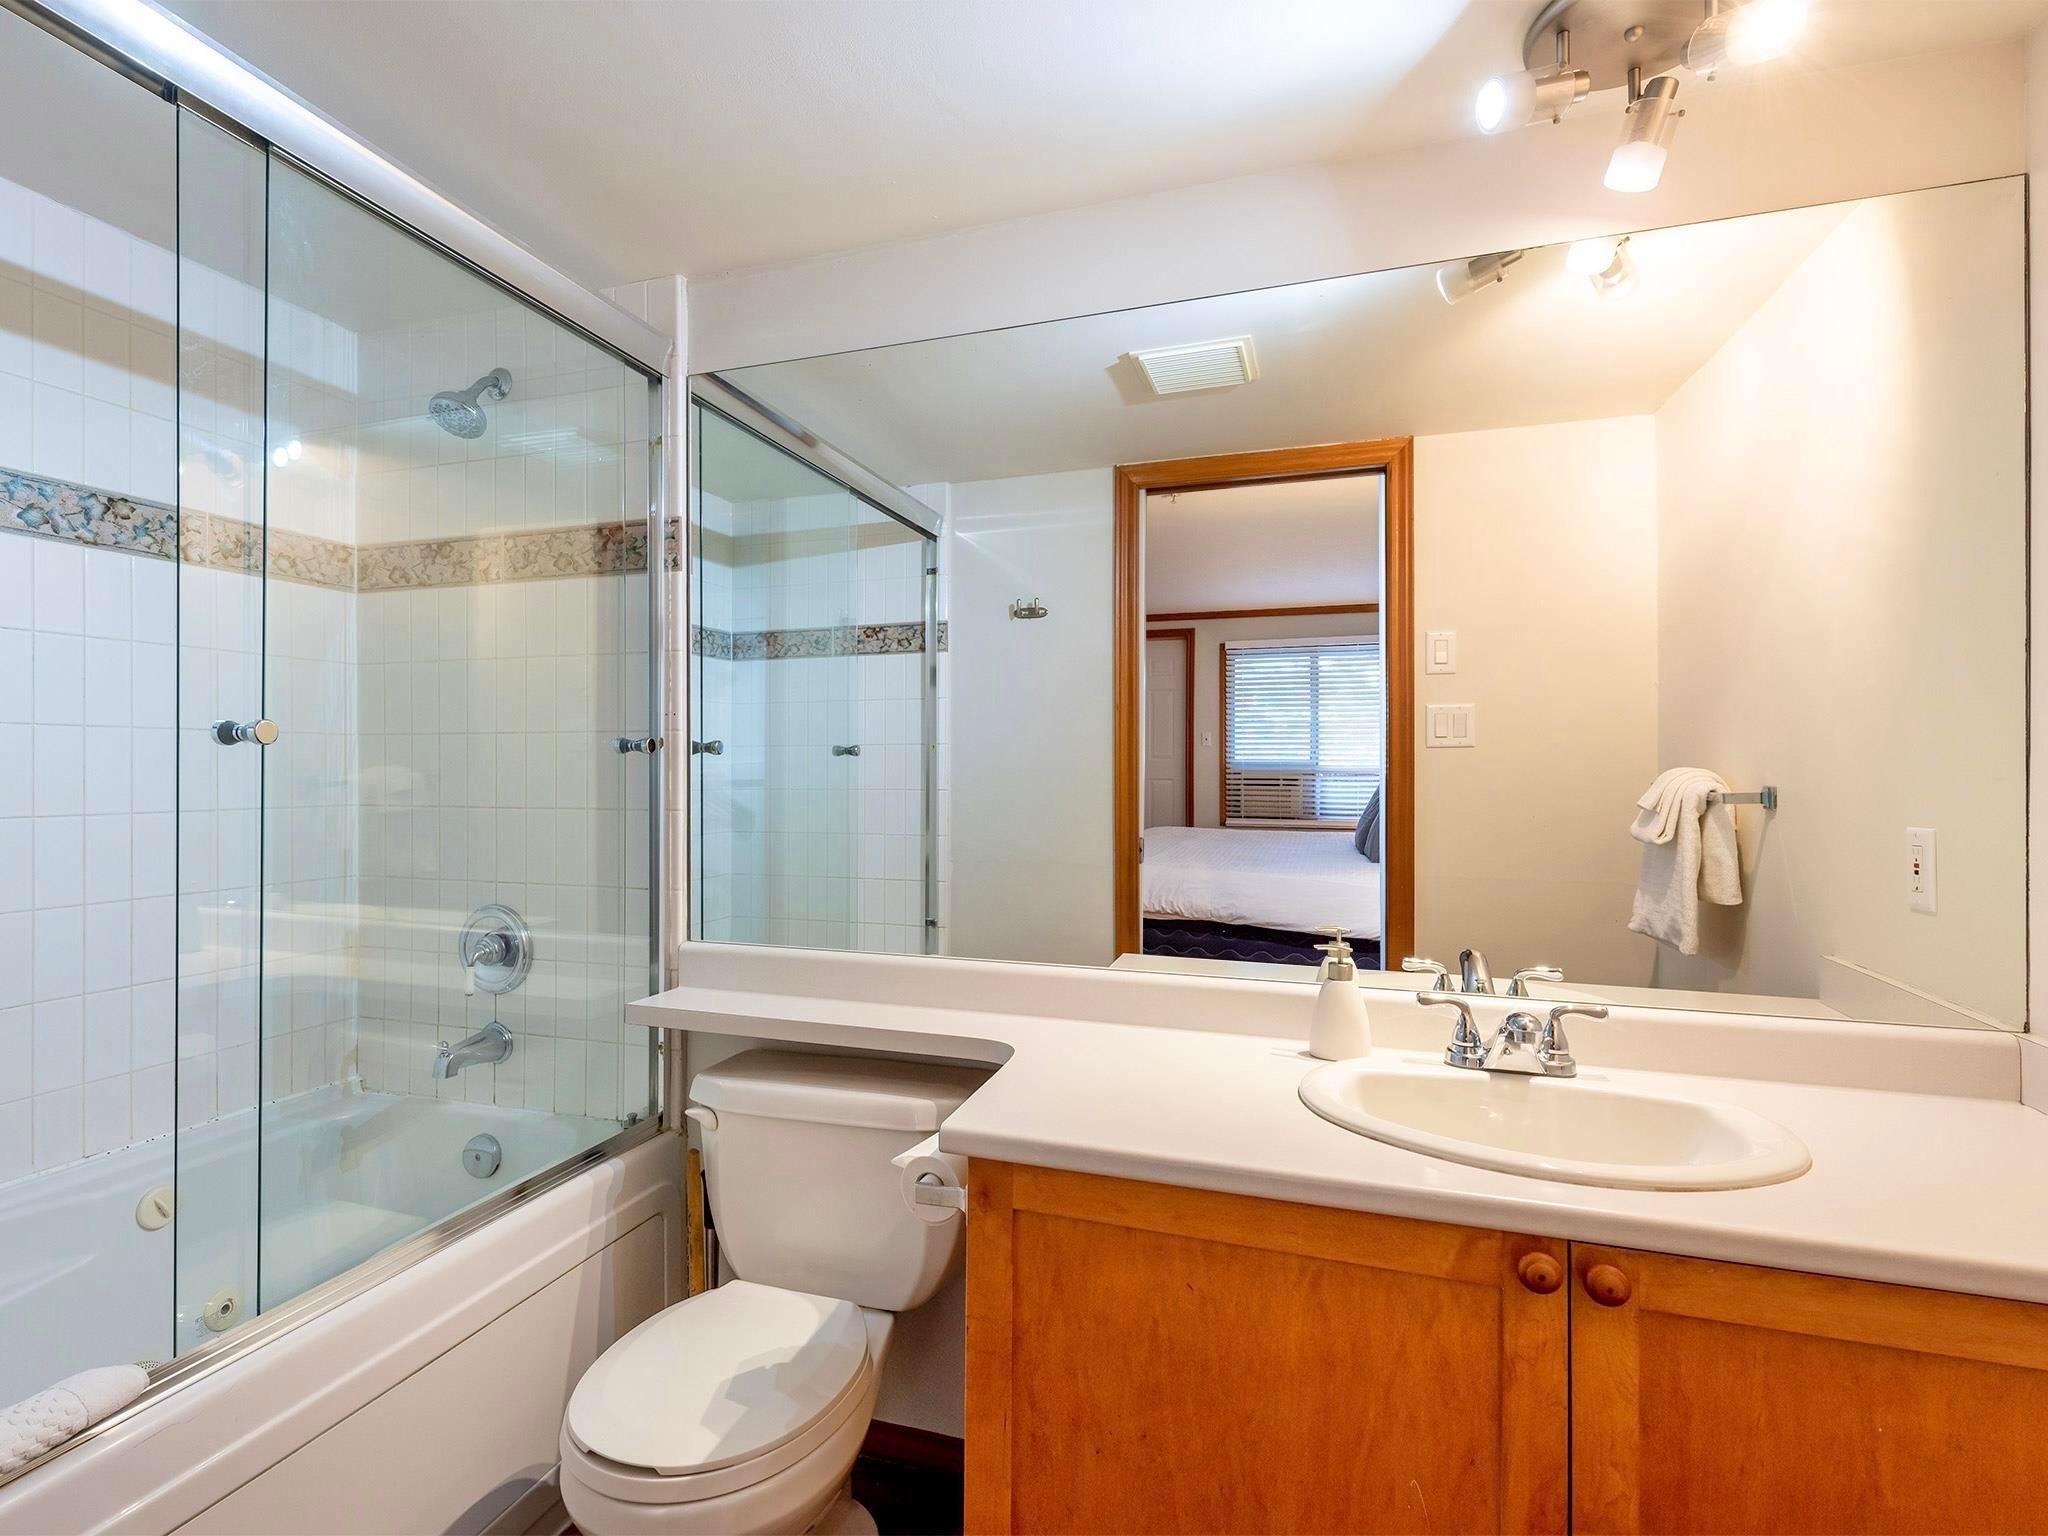 73 4388 NORTHLANDS BOULEVARD - Whistler Village Townhouse for sale, 2 Bedrooms (R2580863) - #12